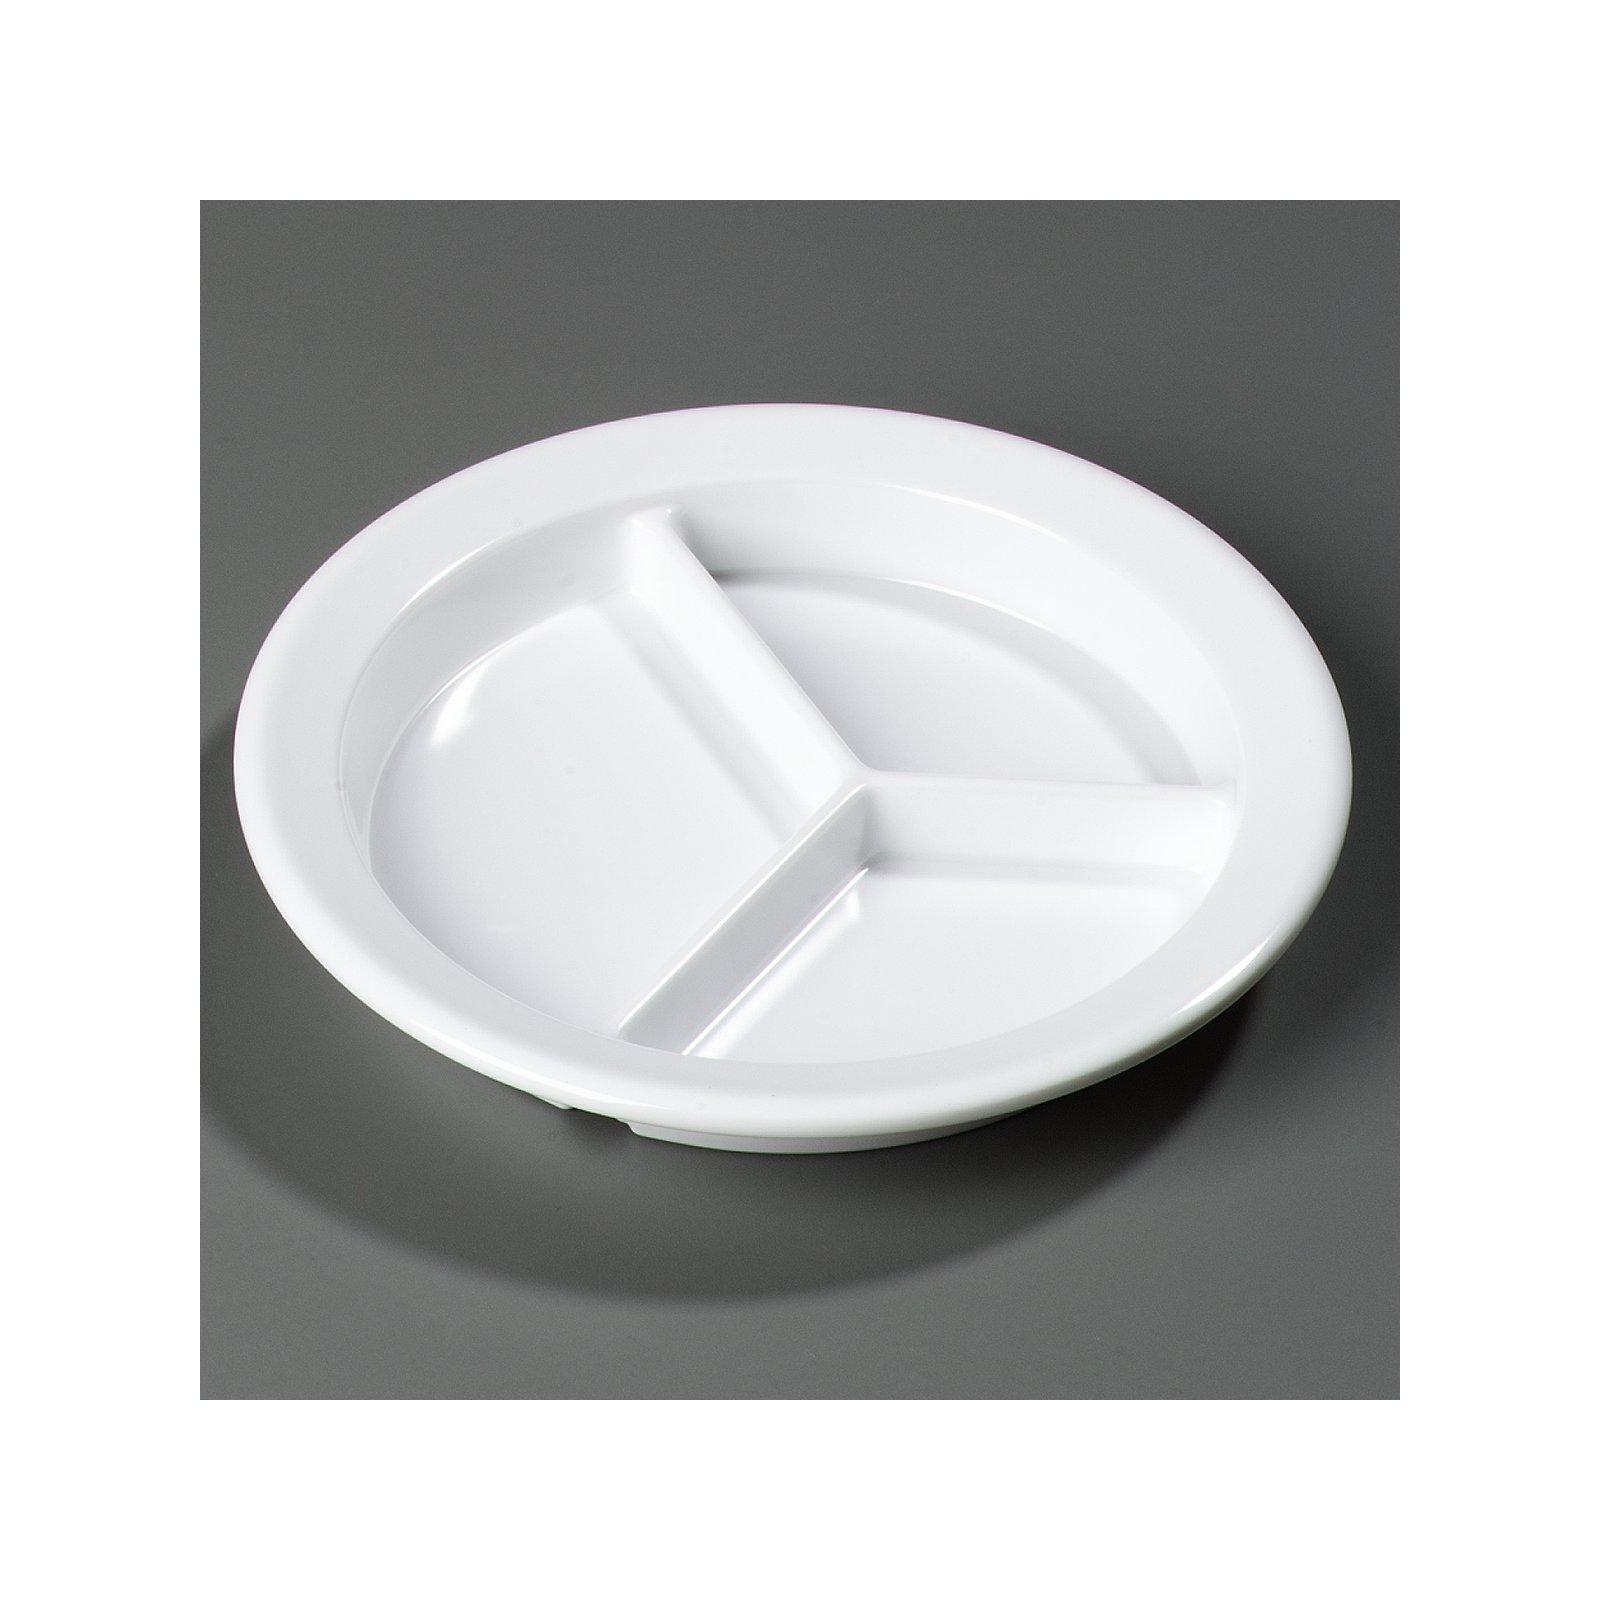 Carlisle 4351602-E Melamine 3-Compartment Deep Plate White Fоur Paсk, White 9